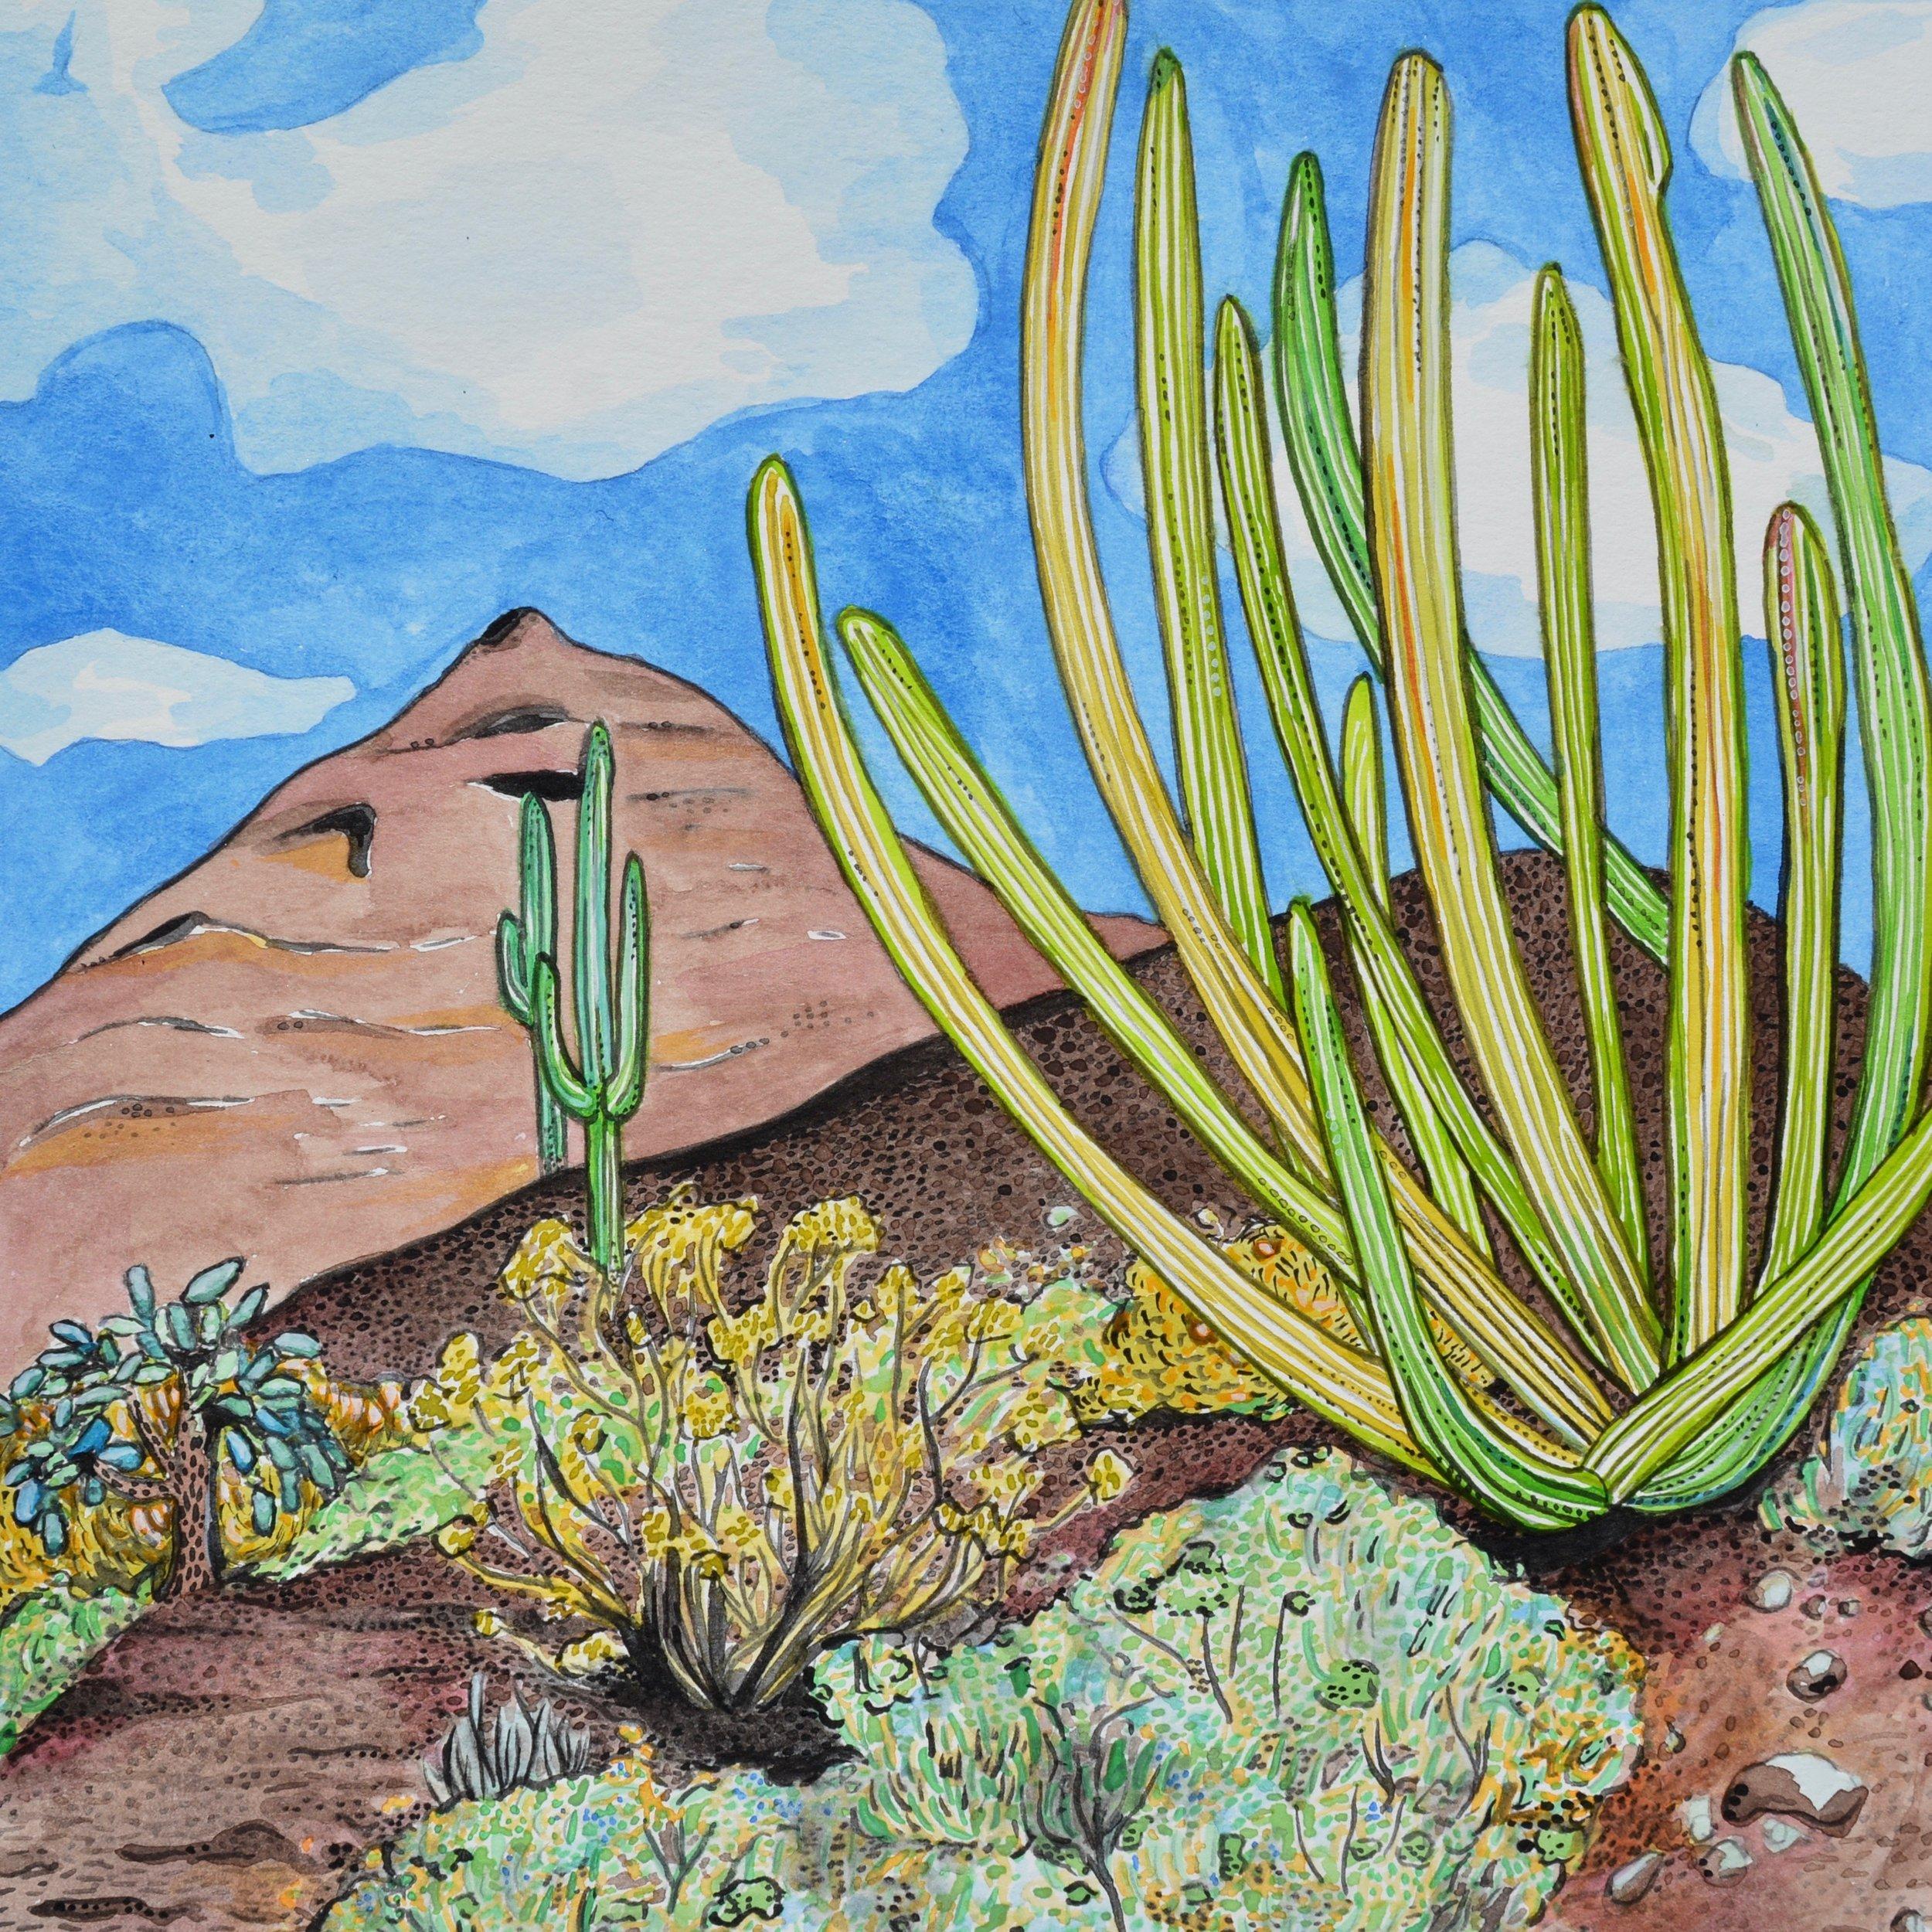 Organ Pipe Cactus National Monument, Arizona: 1/24/17, 13:06:55